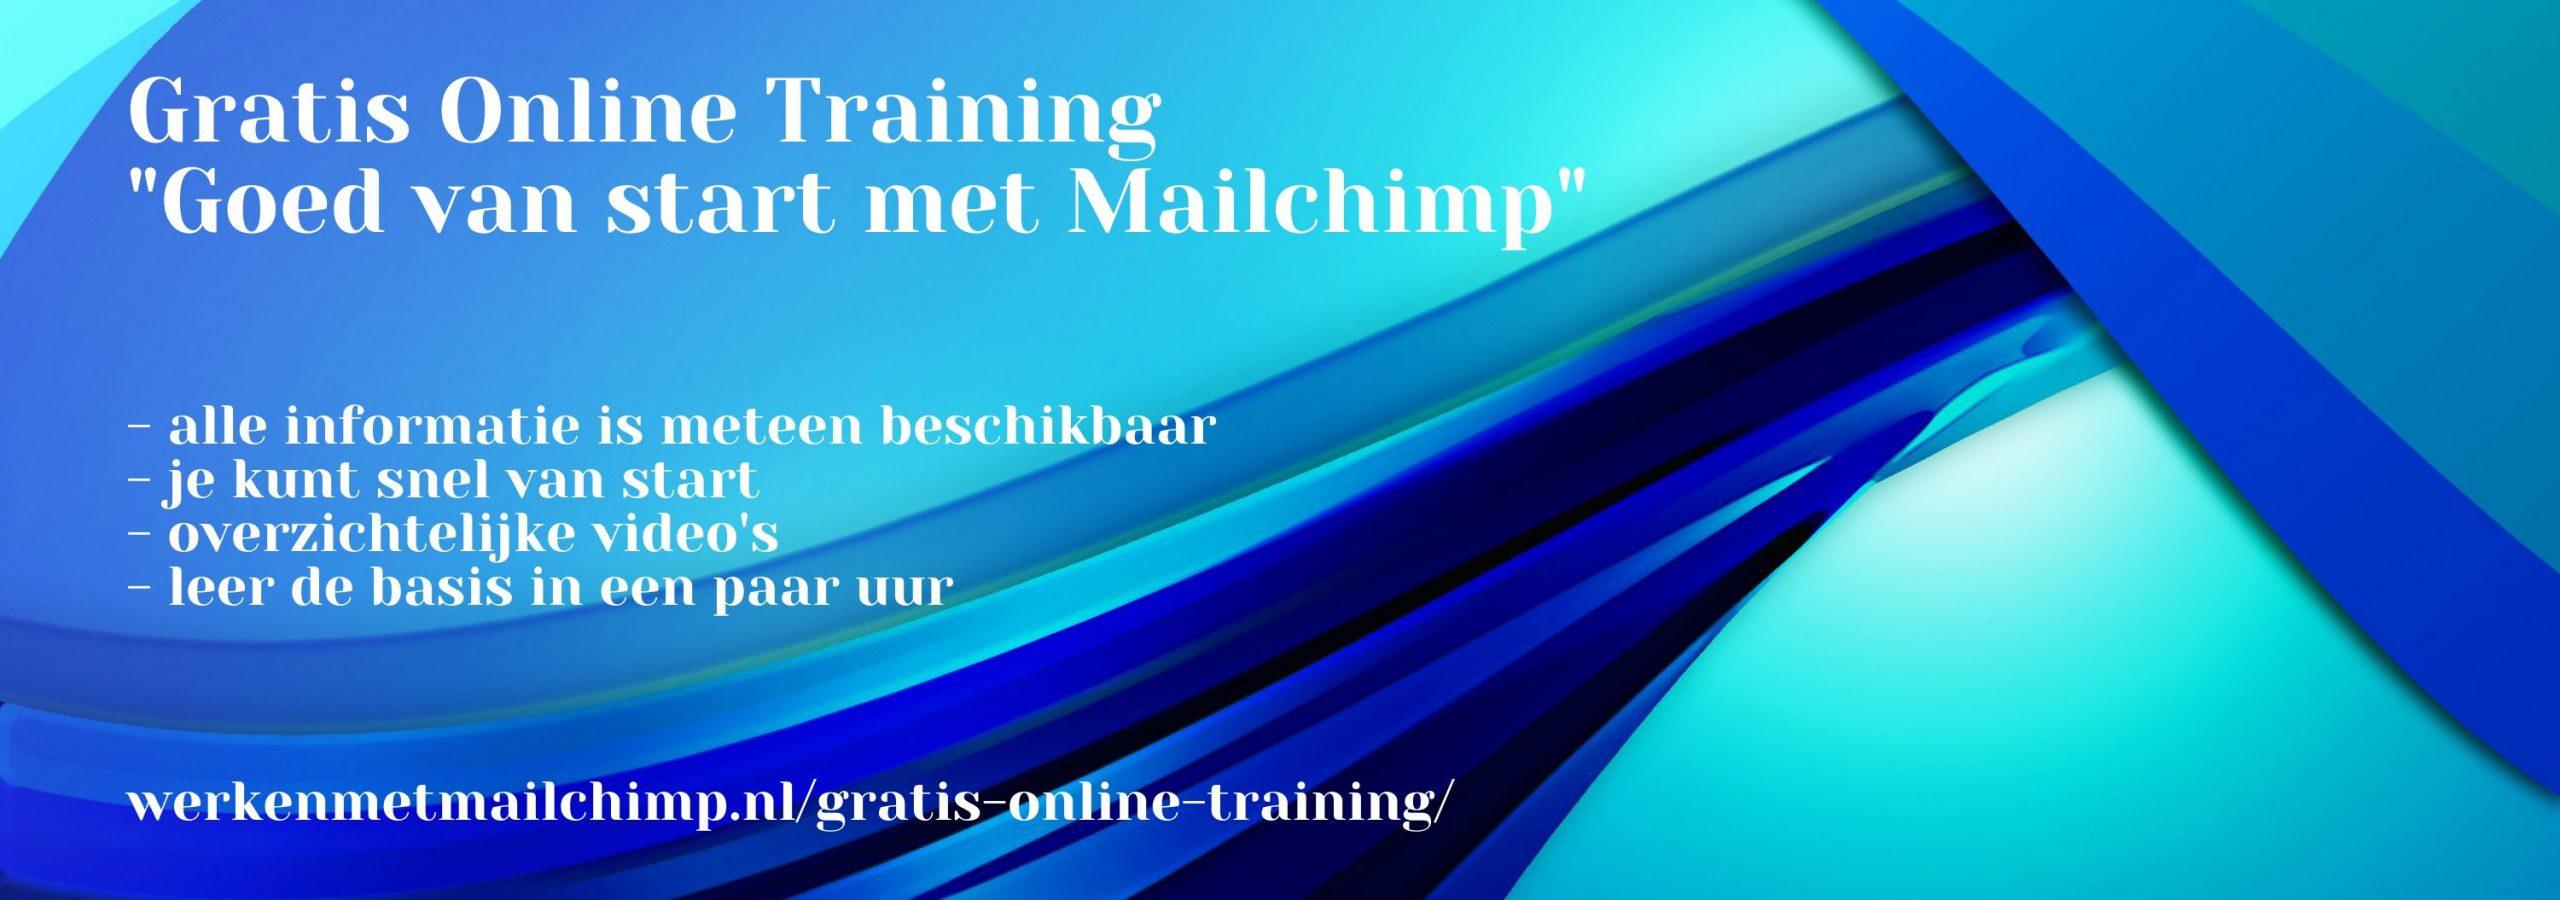 Gratis online training